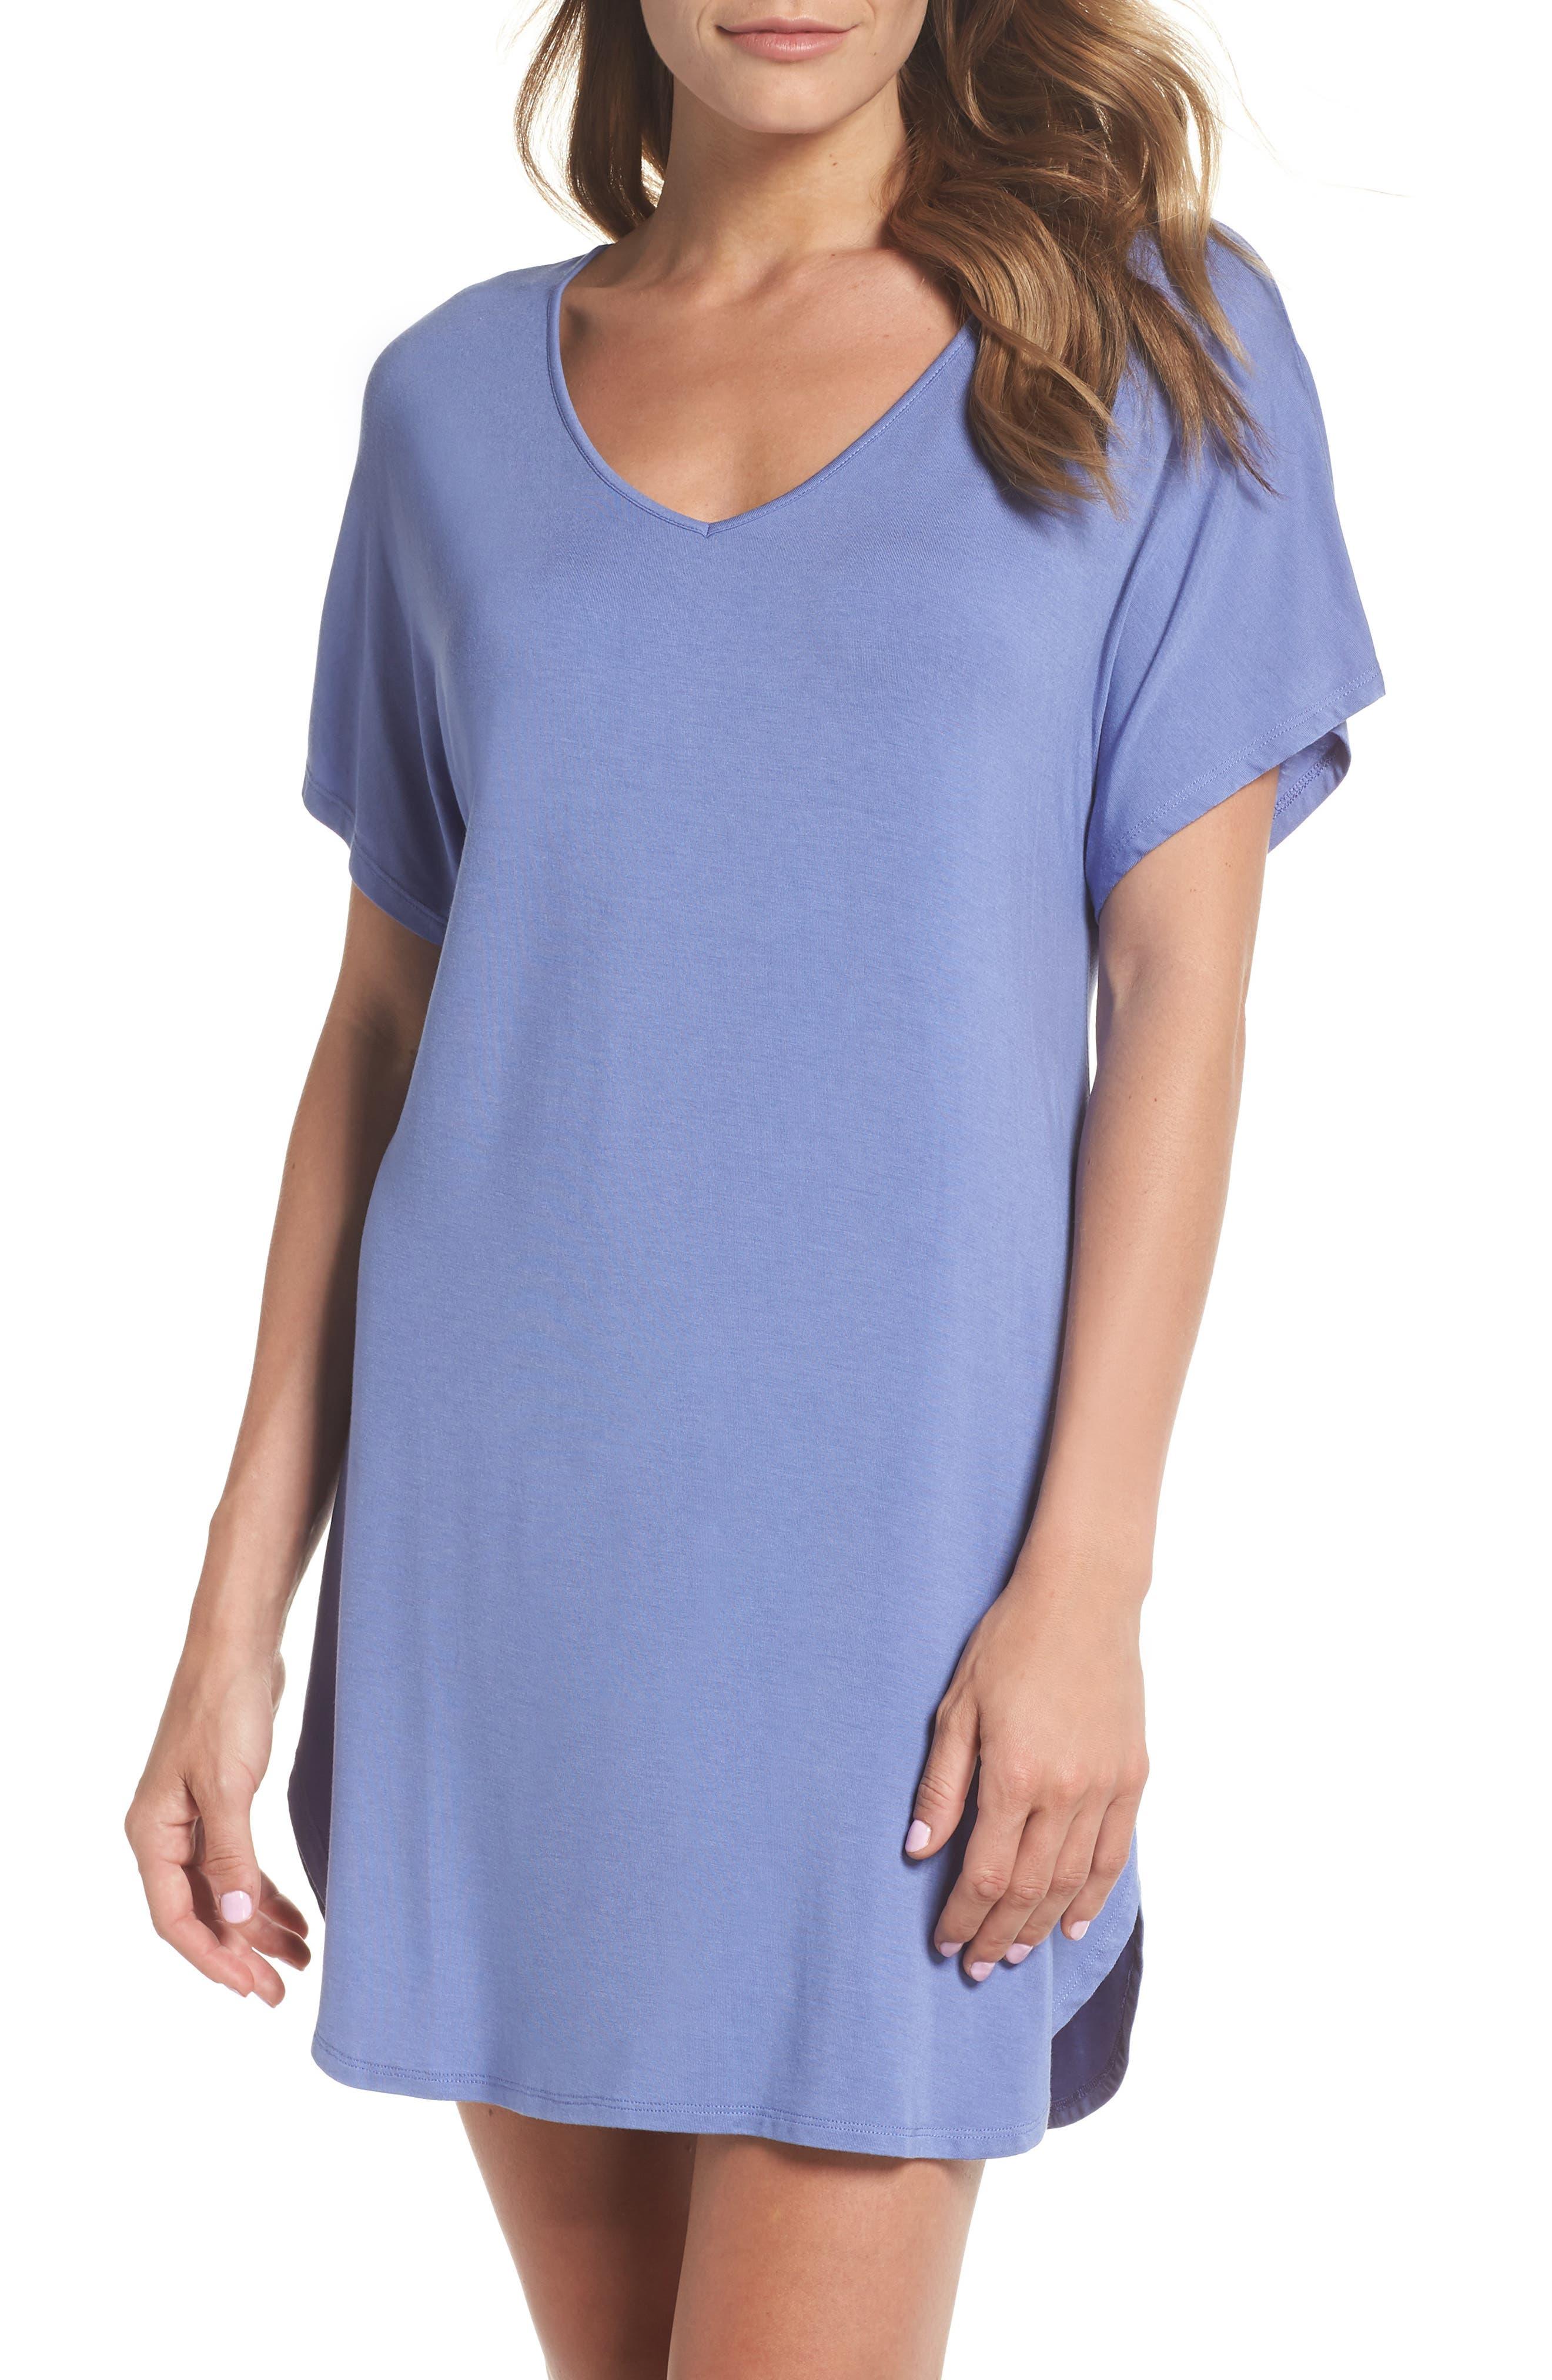 Dolman Sleeve Nightshirt,                         Main,                         color, Blue Denim